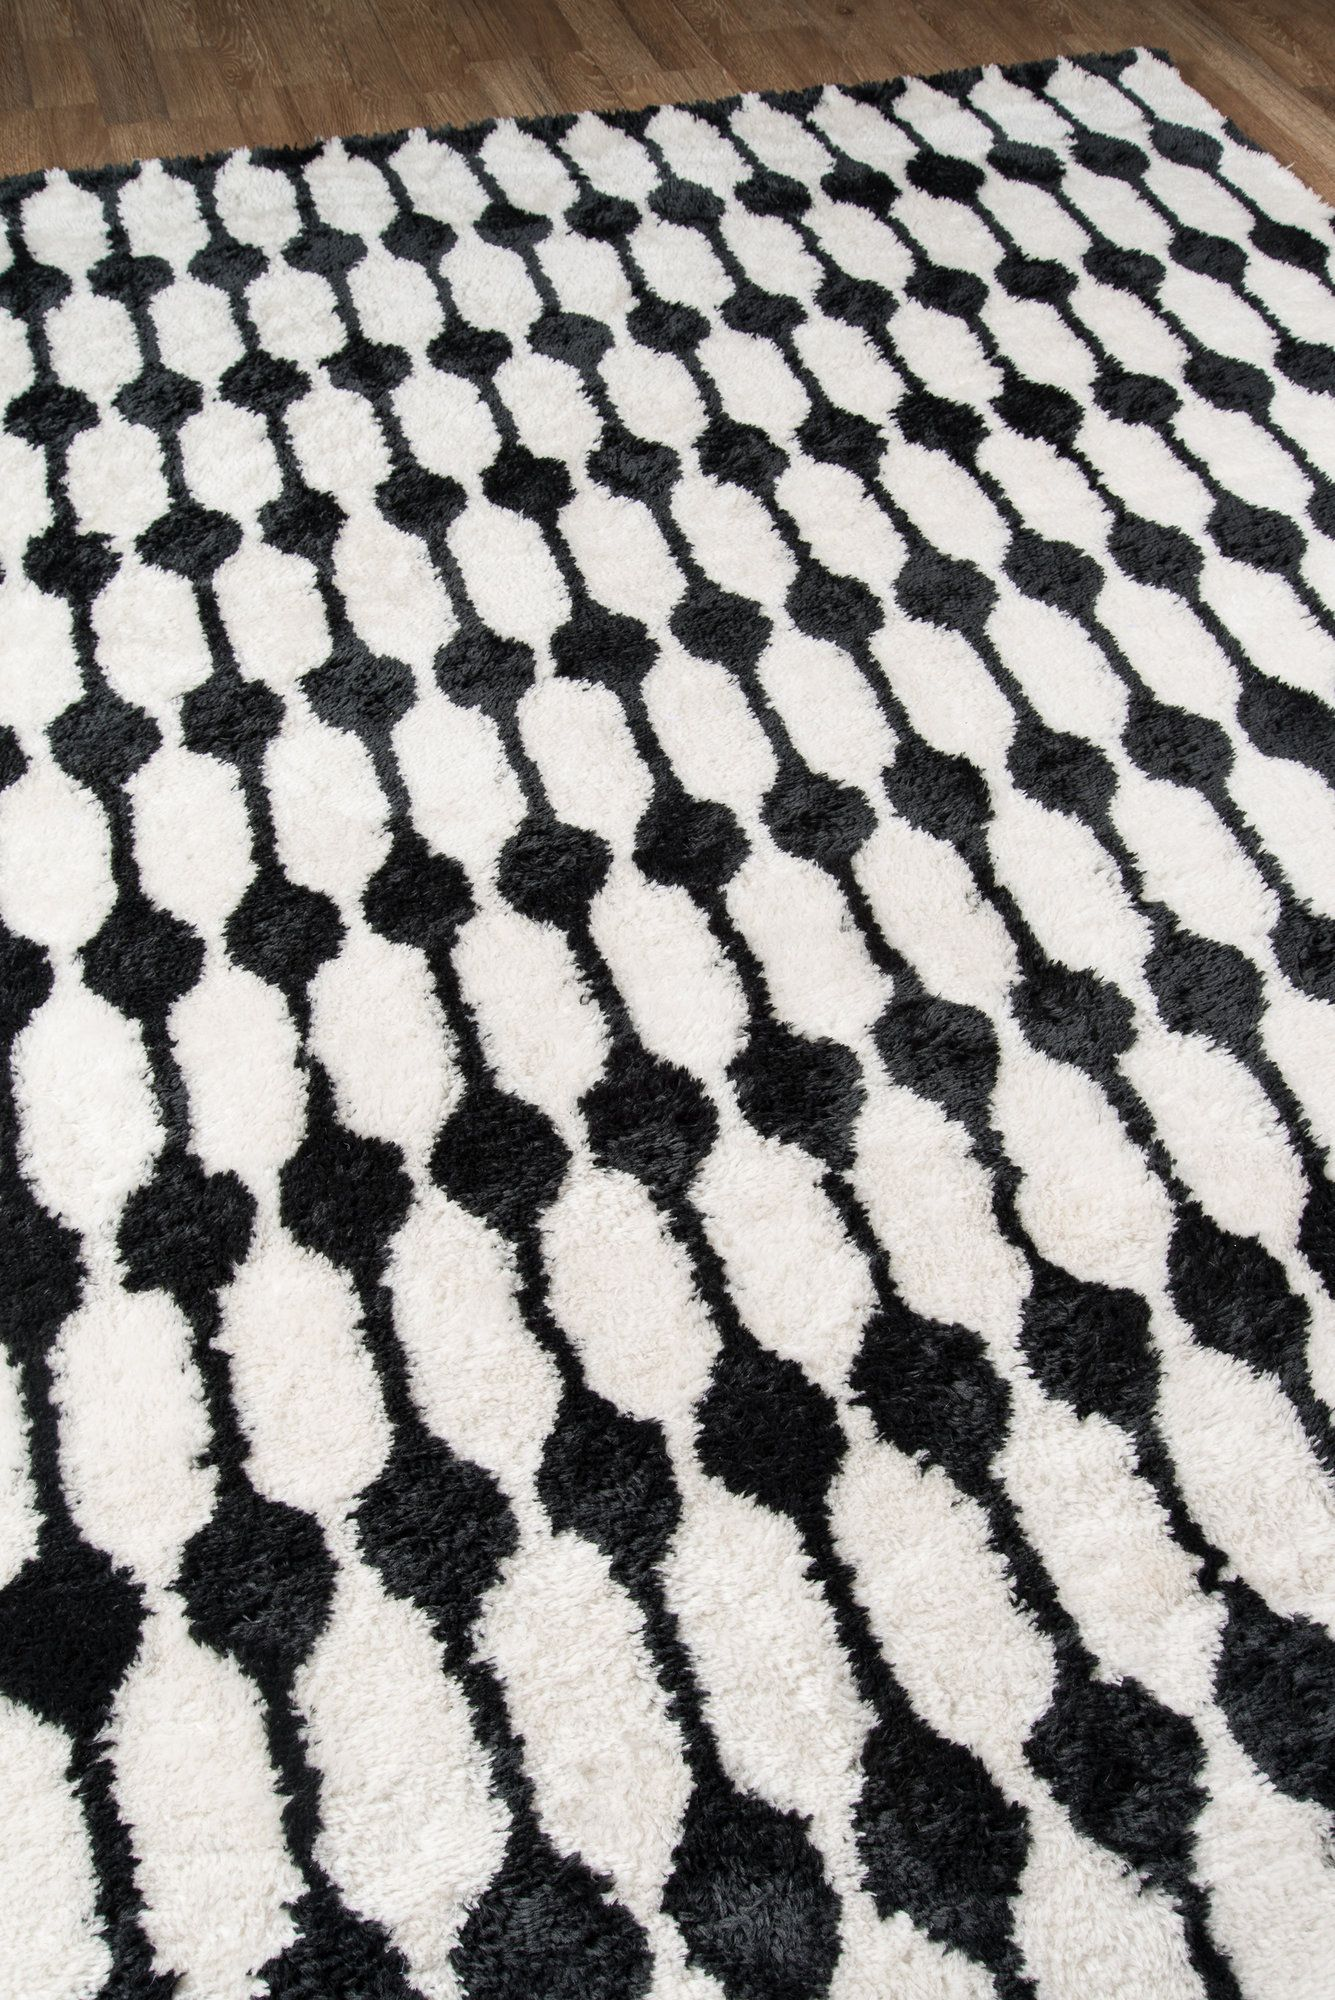 Geometric Handmade Tufted Black White Area Rug In 2019 Black Rug